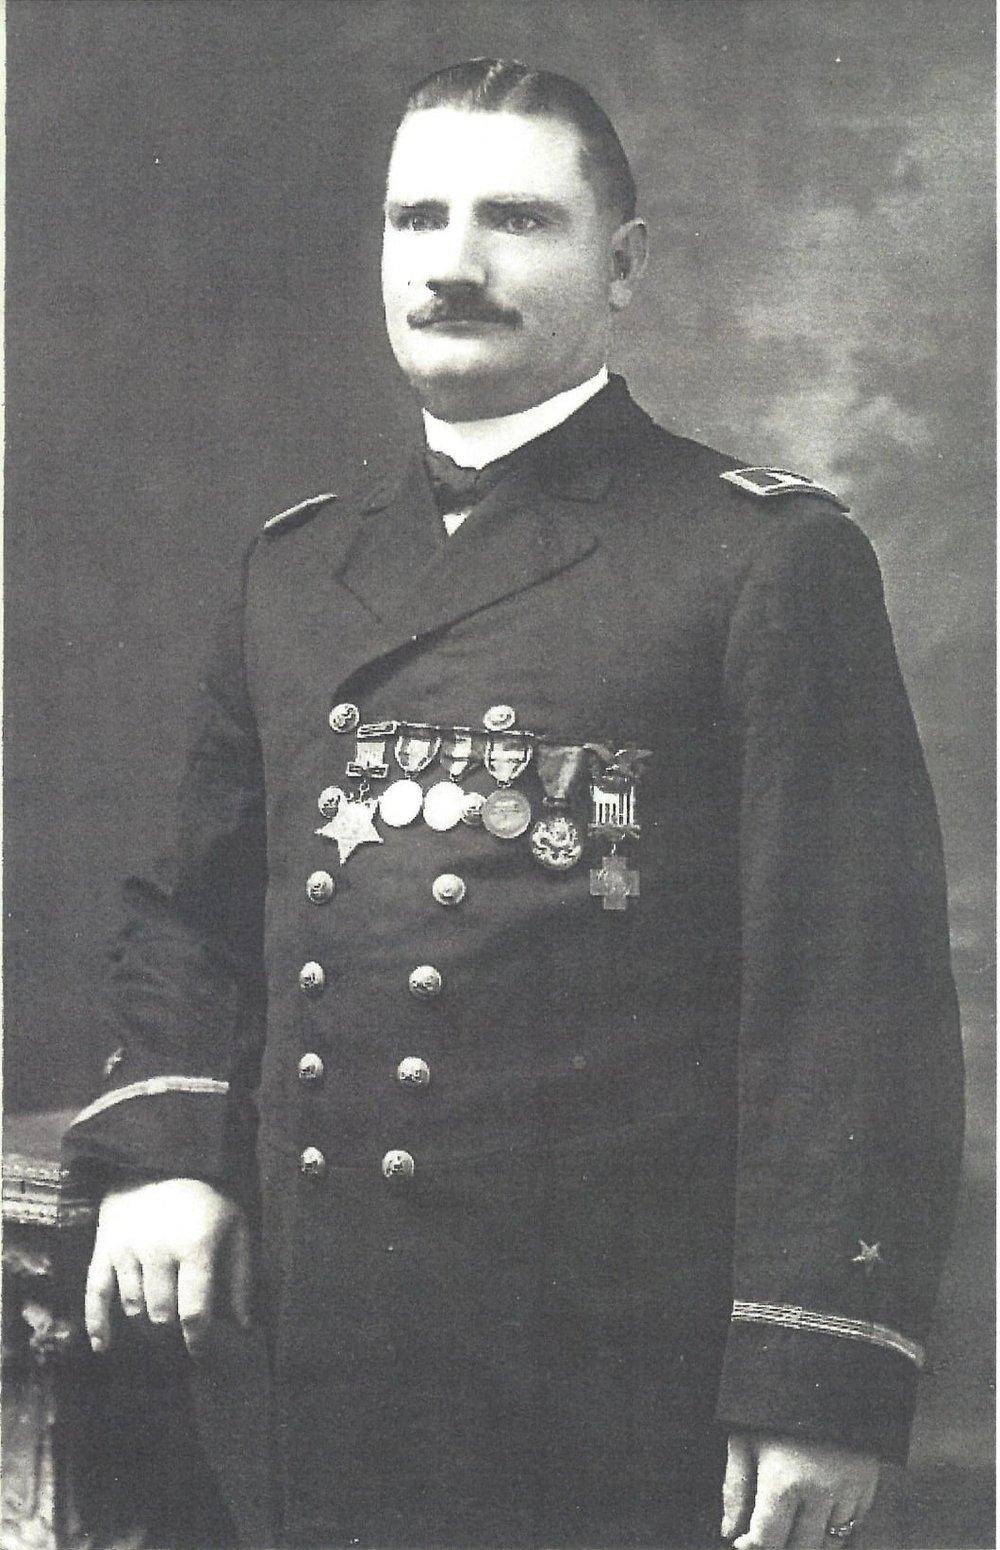 John McCloy 1900-1.jpg